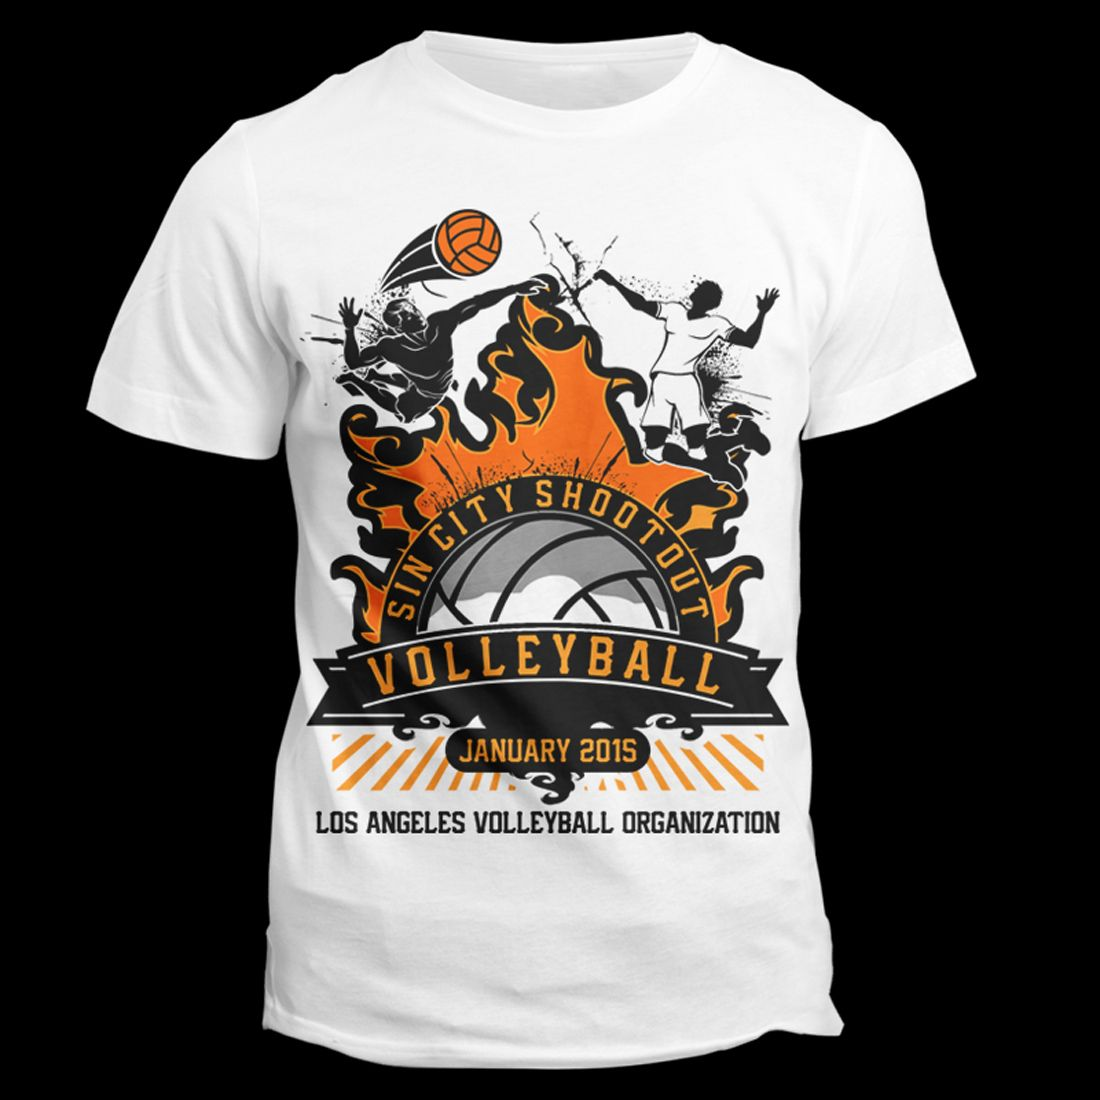 Caz Creations Tshirt Designs Team Shirt Designs Volleyball T Shirt Designs Volleyball Tshirts